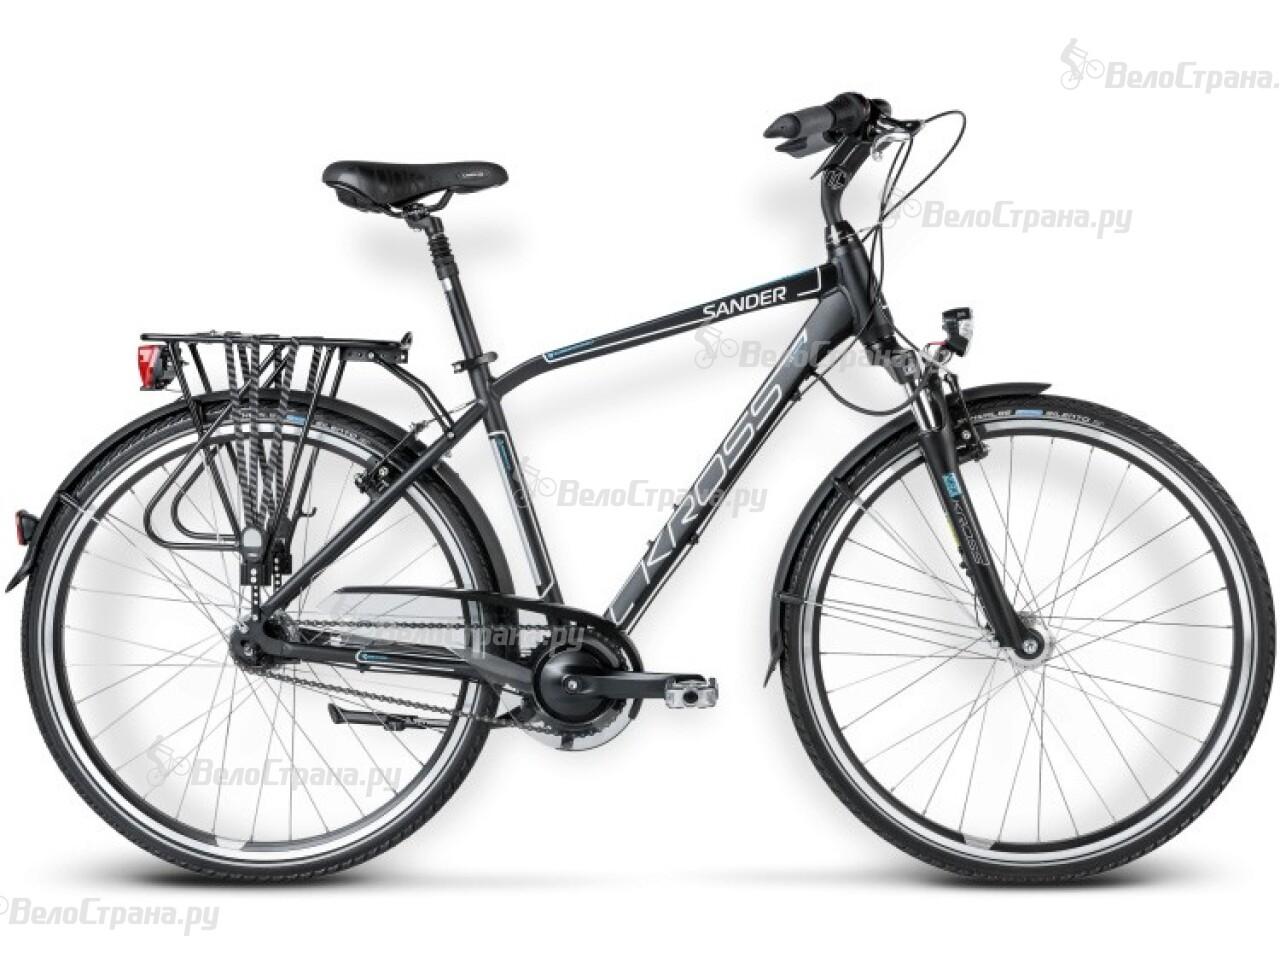 Велосипед Kross TRANS SANDER (2016)